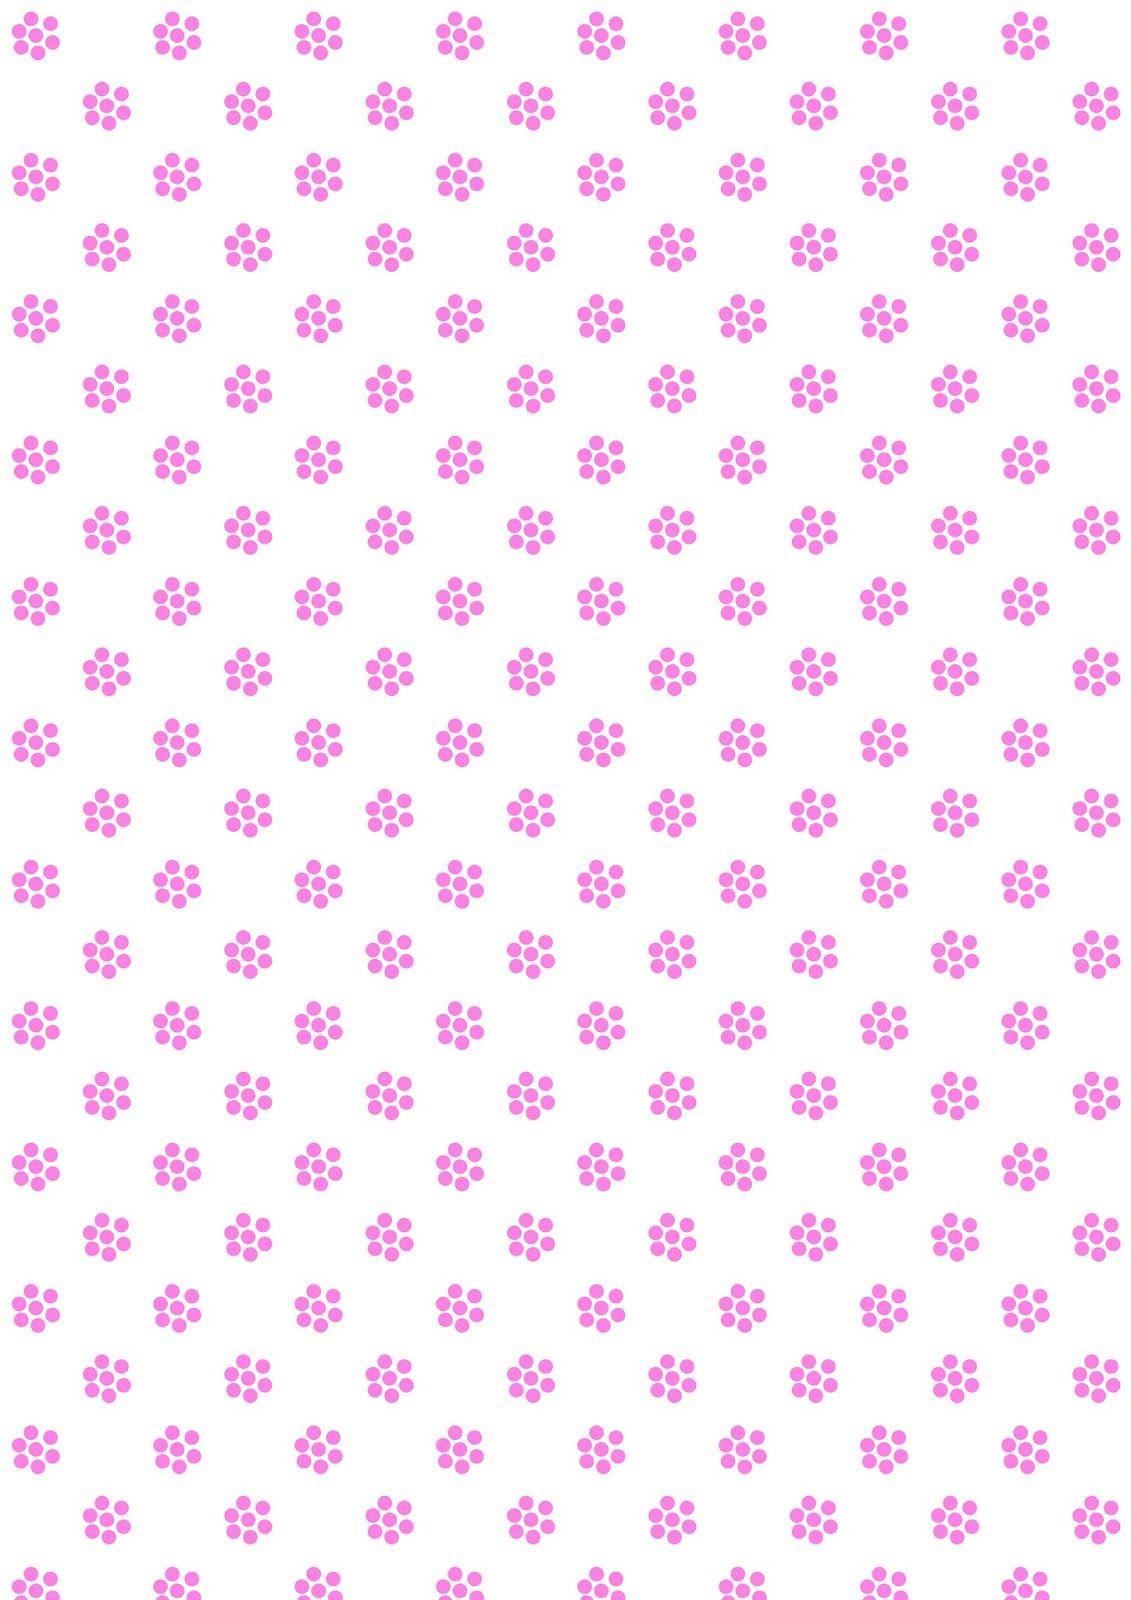 Free Digital Floral Pattern Paper   Free Printables ✄ And More - Free Printable Pattern Paper Sheets